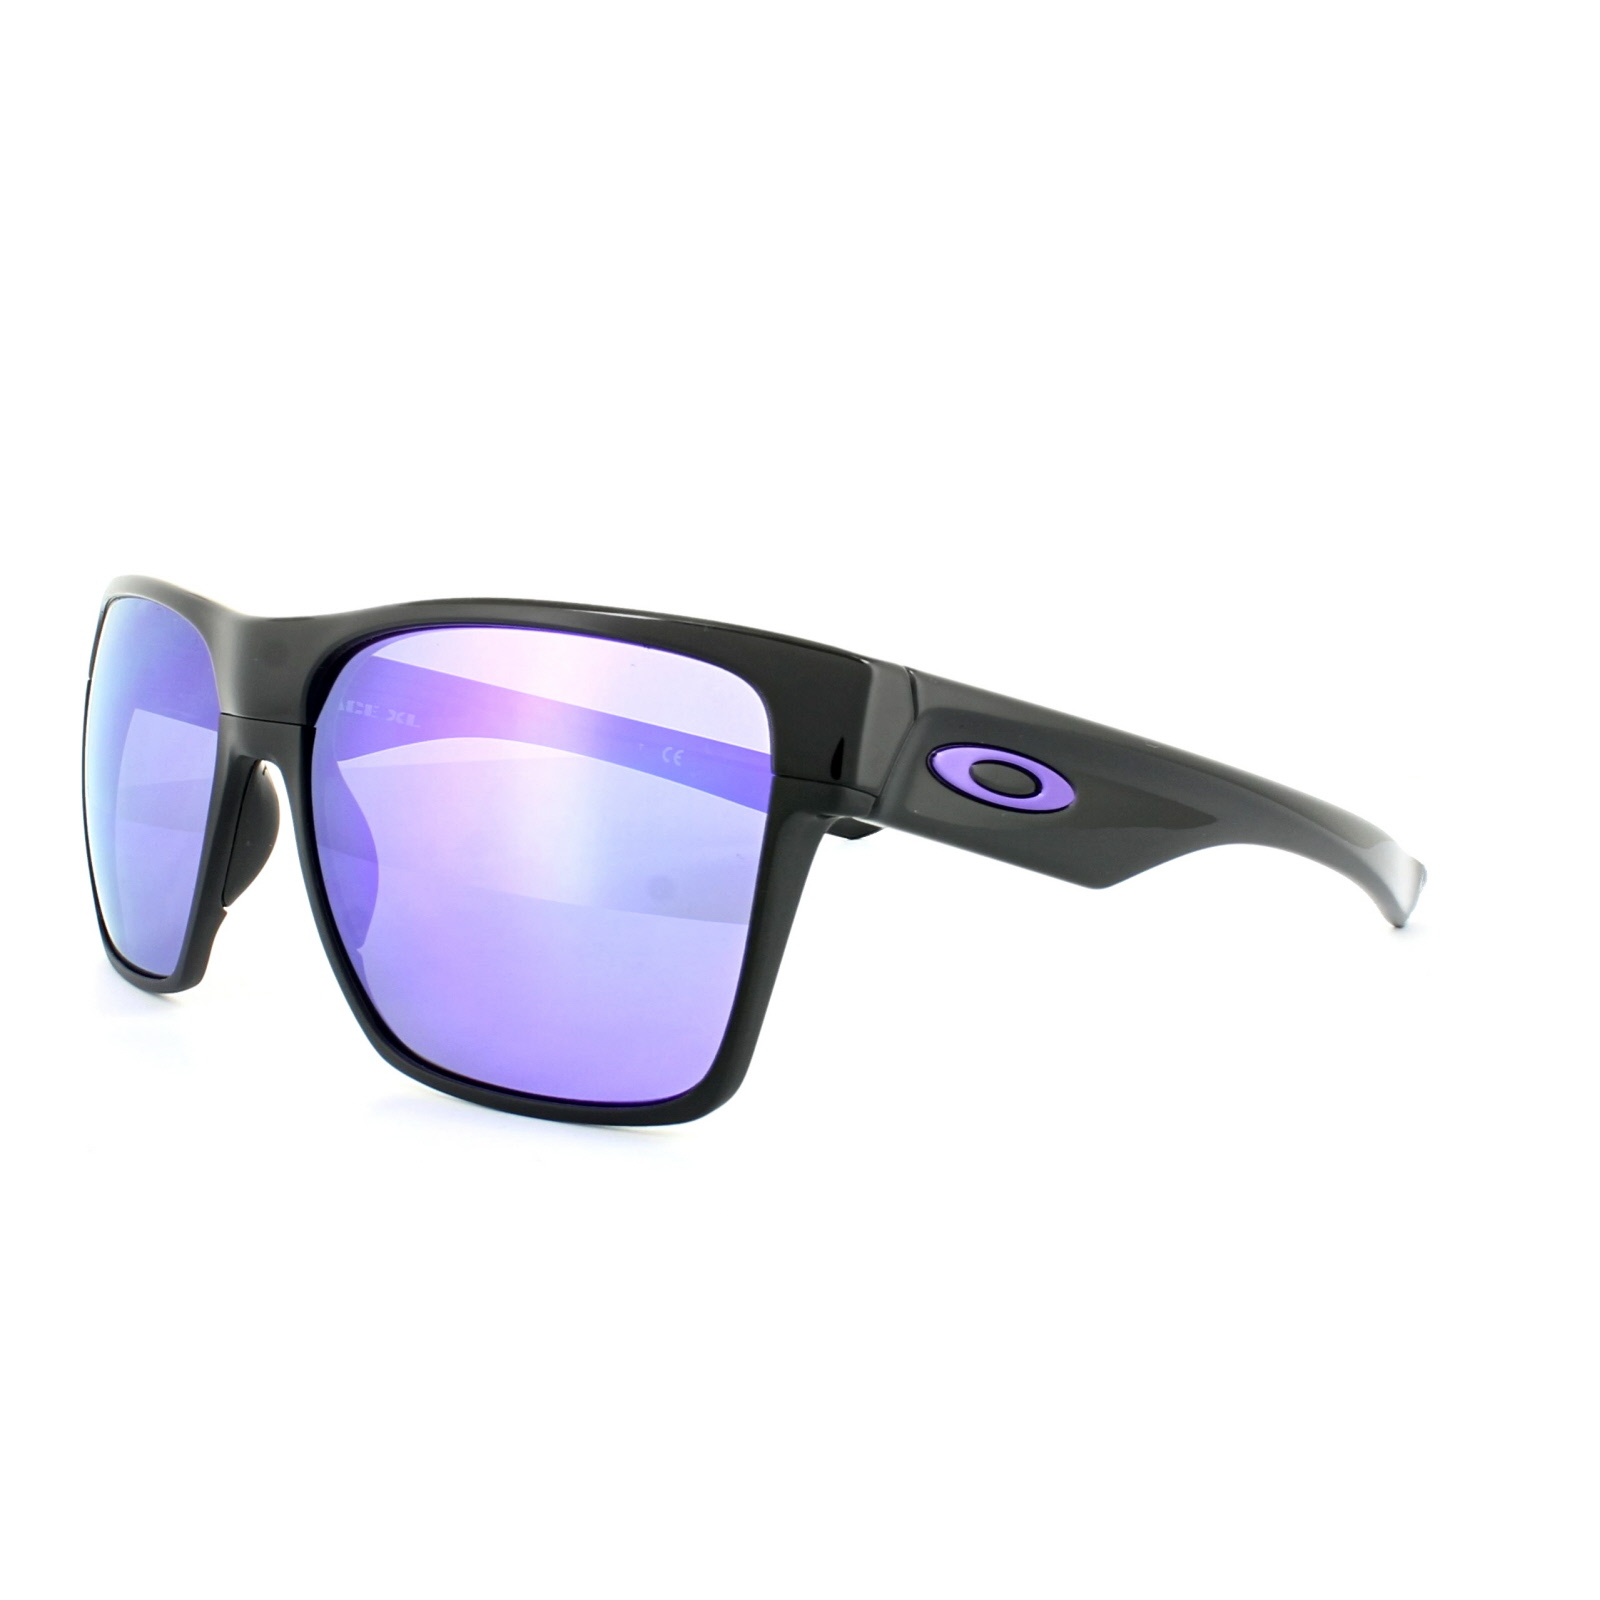 37dcd8853 Sentinel Oakley Sunglasses TwoFace XL OO9350-04 Polished Black Violet  Iridium